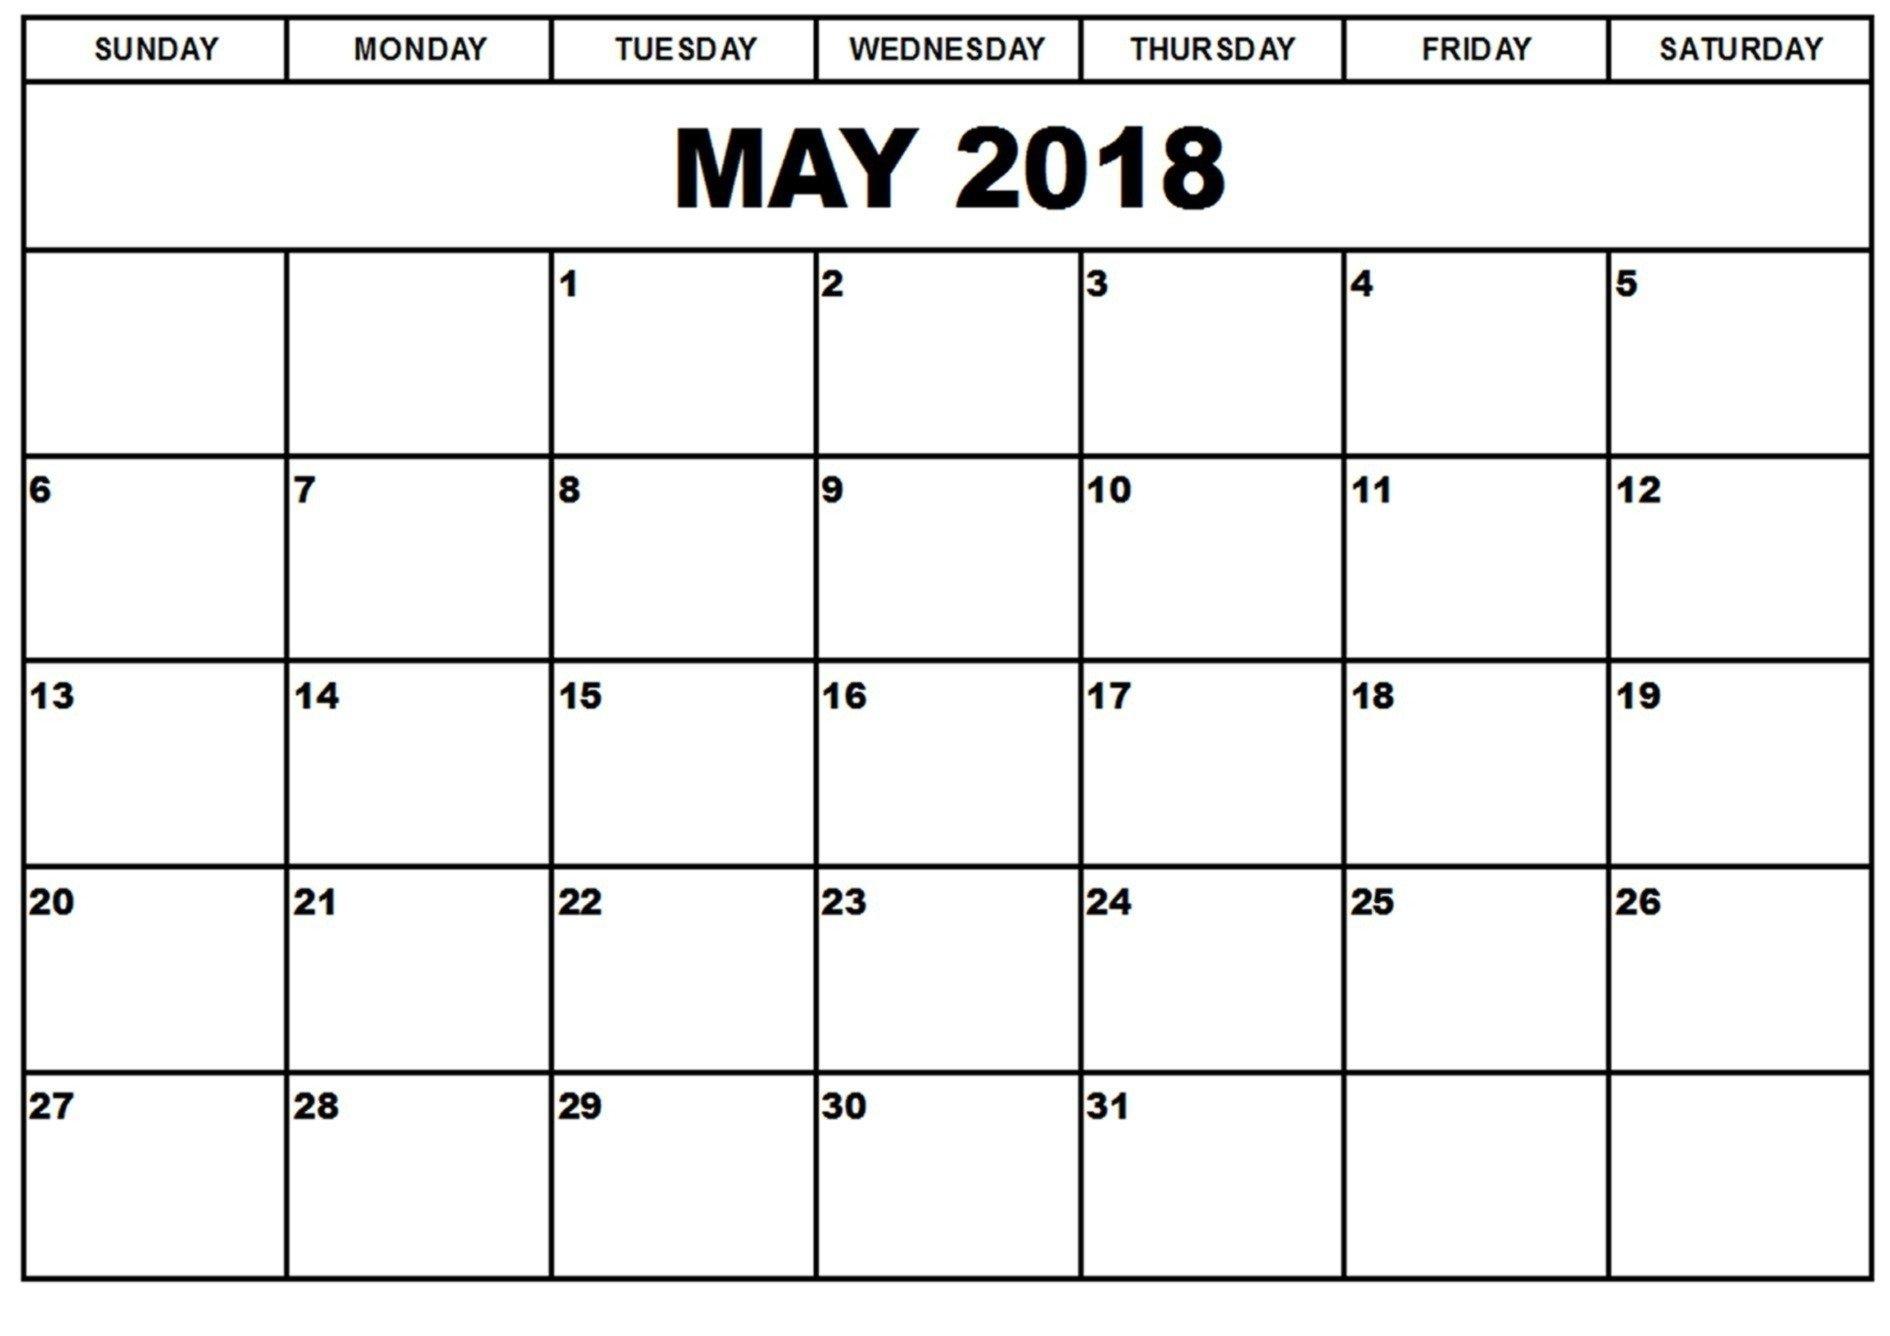 Sunday To Saturday Calendar | Calendar Template Printable Saturday To Friday Calendar Template